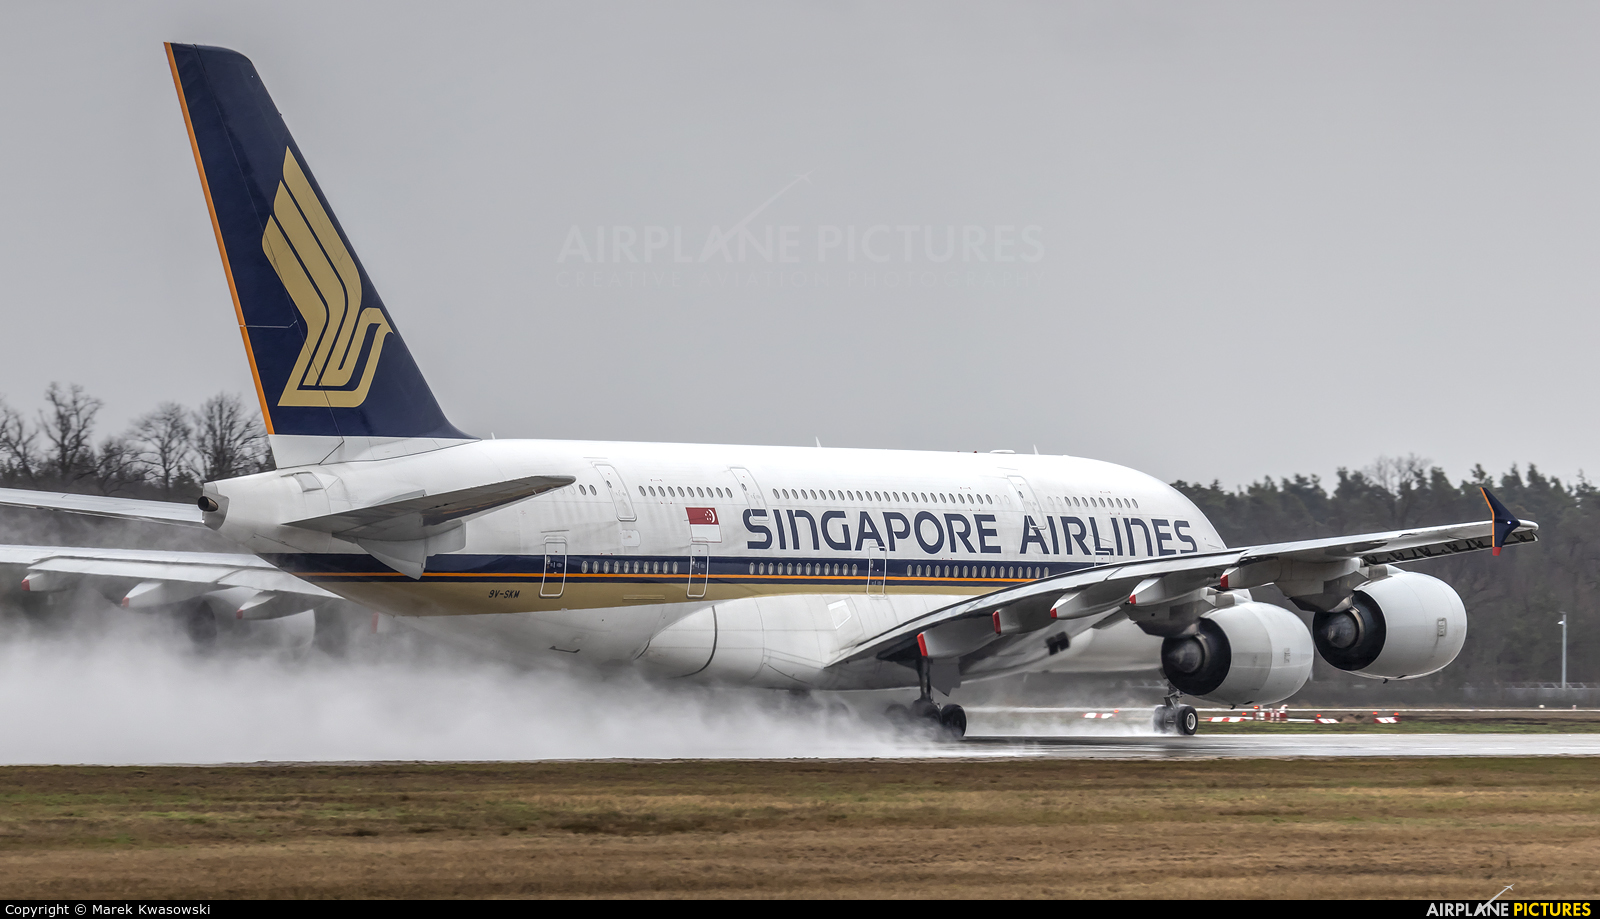 Singapore Airlines 9V-SKM aircraft at Frankfurt